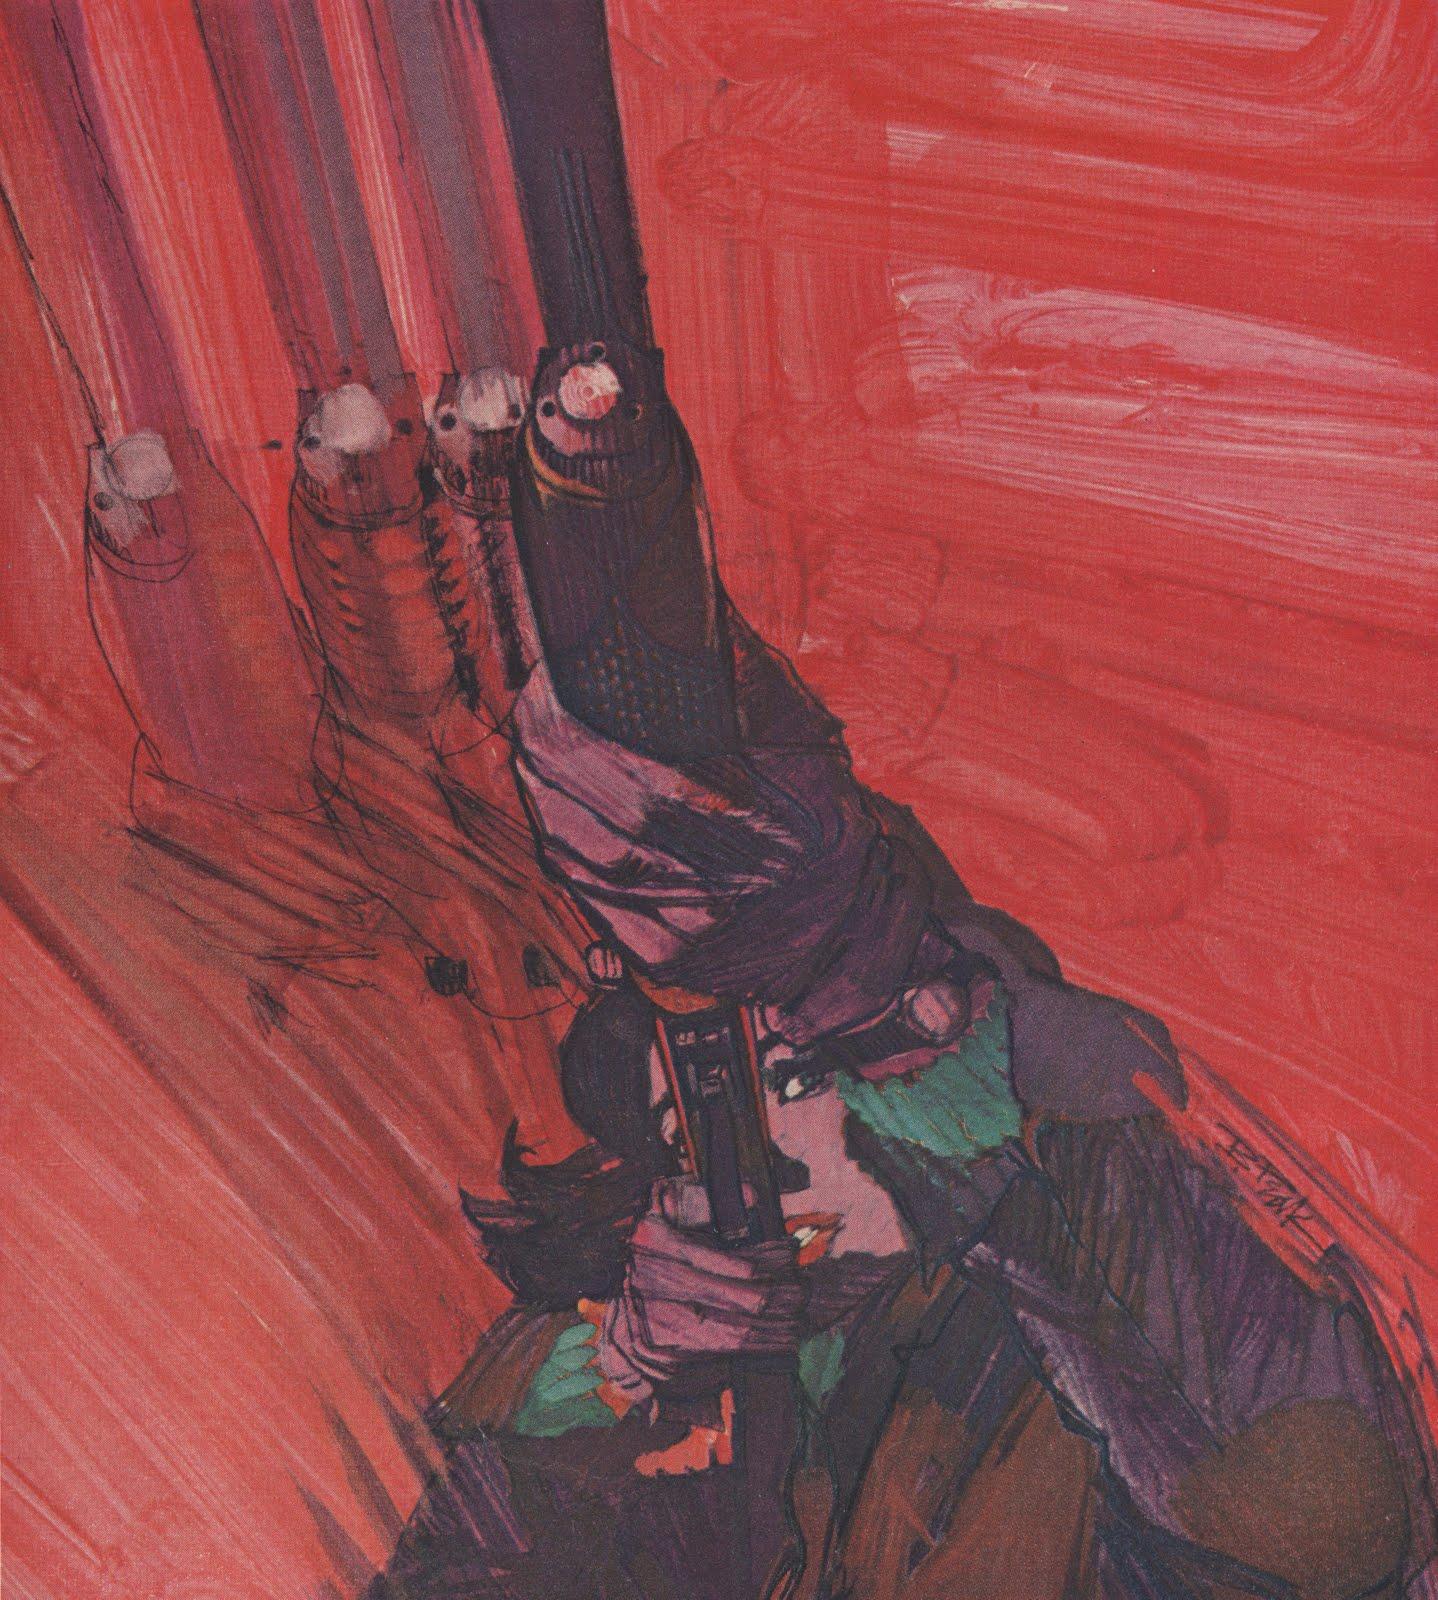 Art Illustration: ILLUSTRATION ART: THE SPRINGTIME OF BOB PEAK